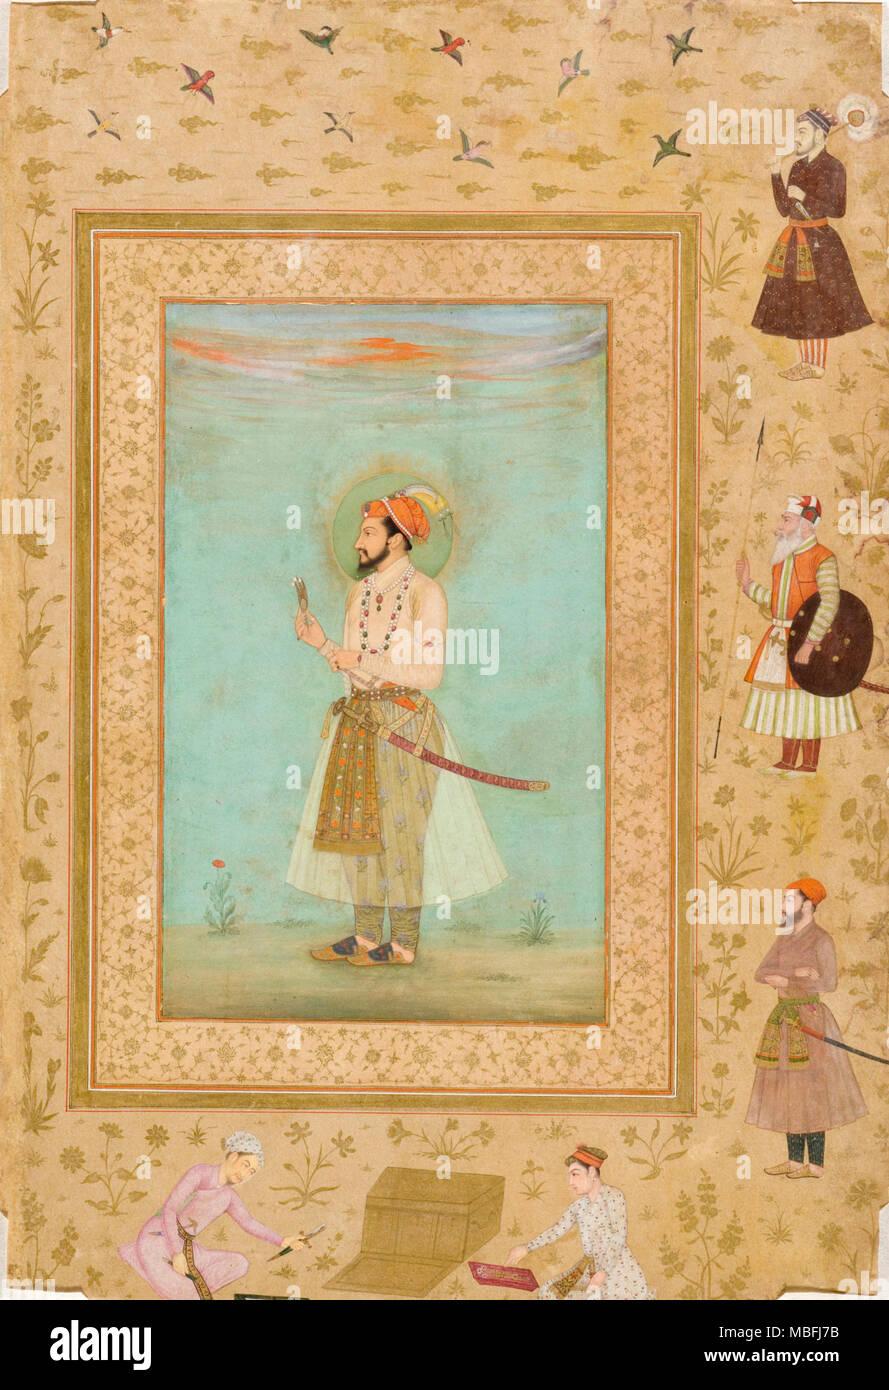 Emperor Shah Jahan - Stock Image